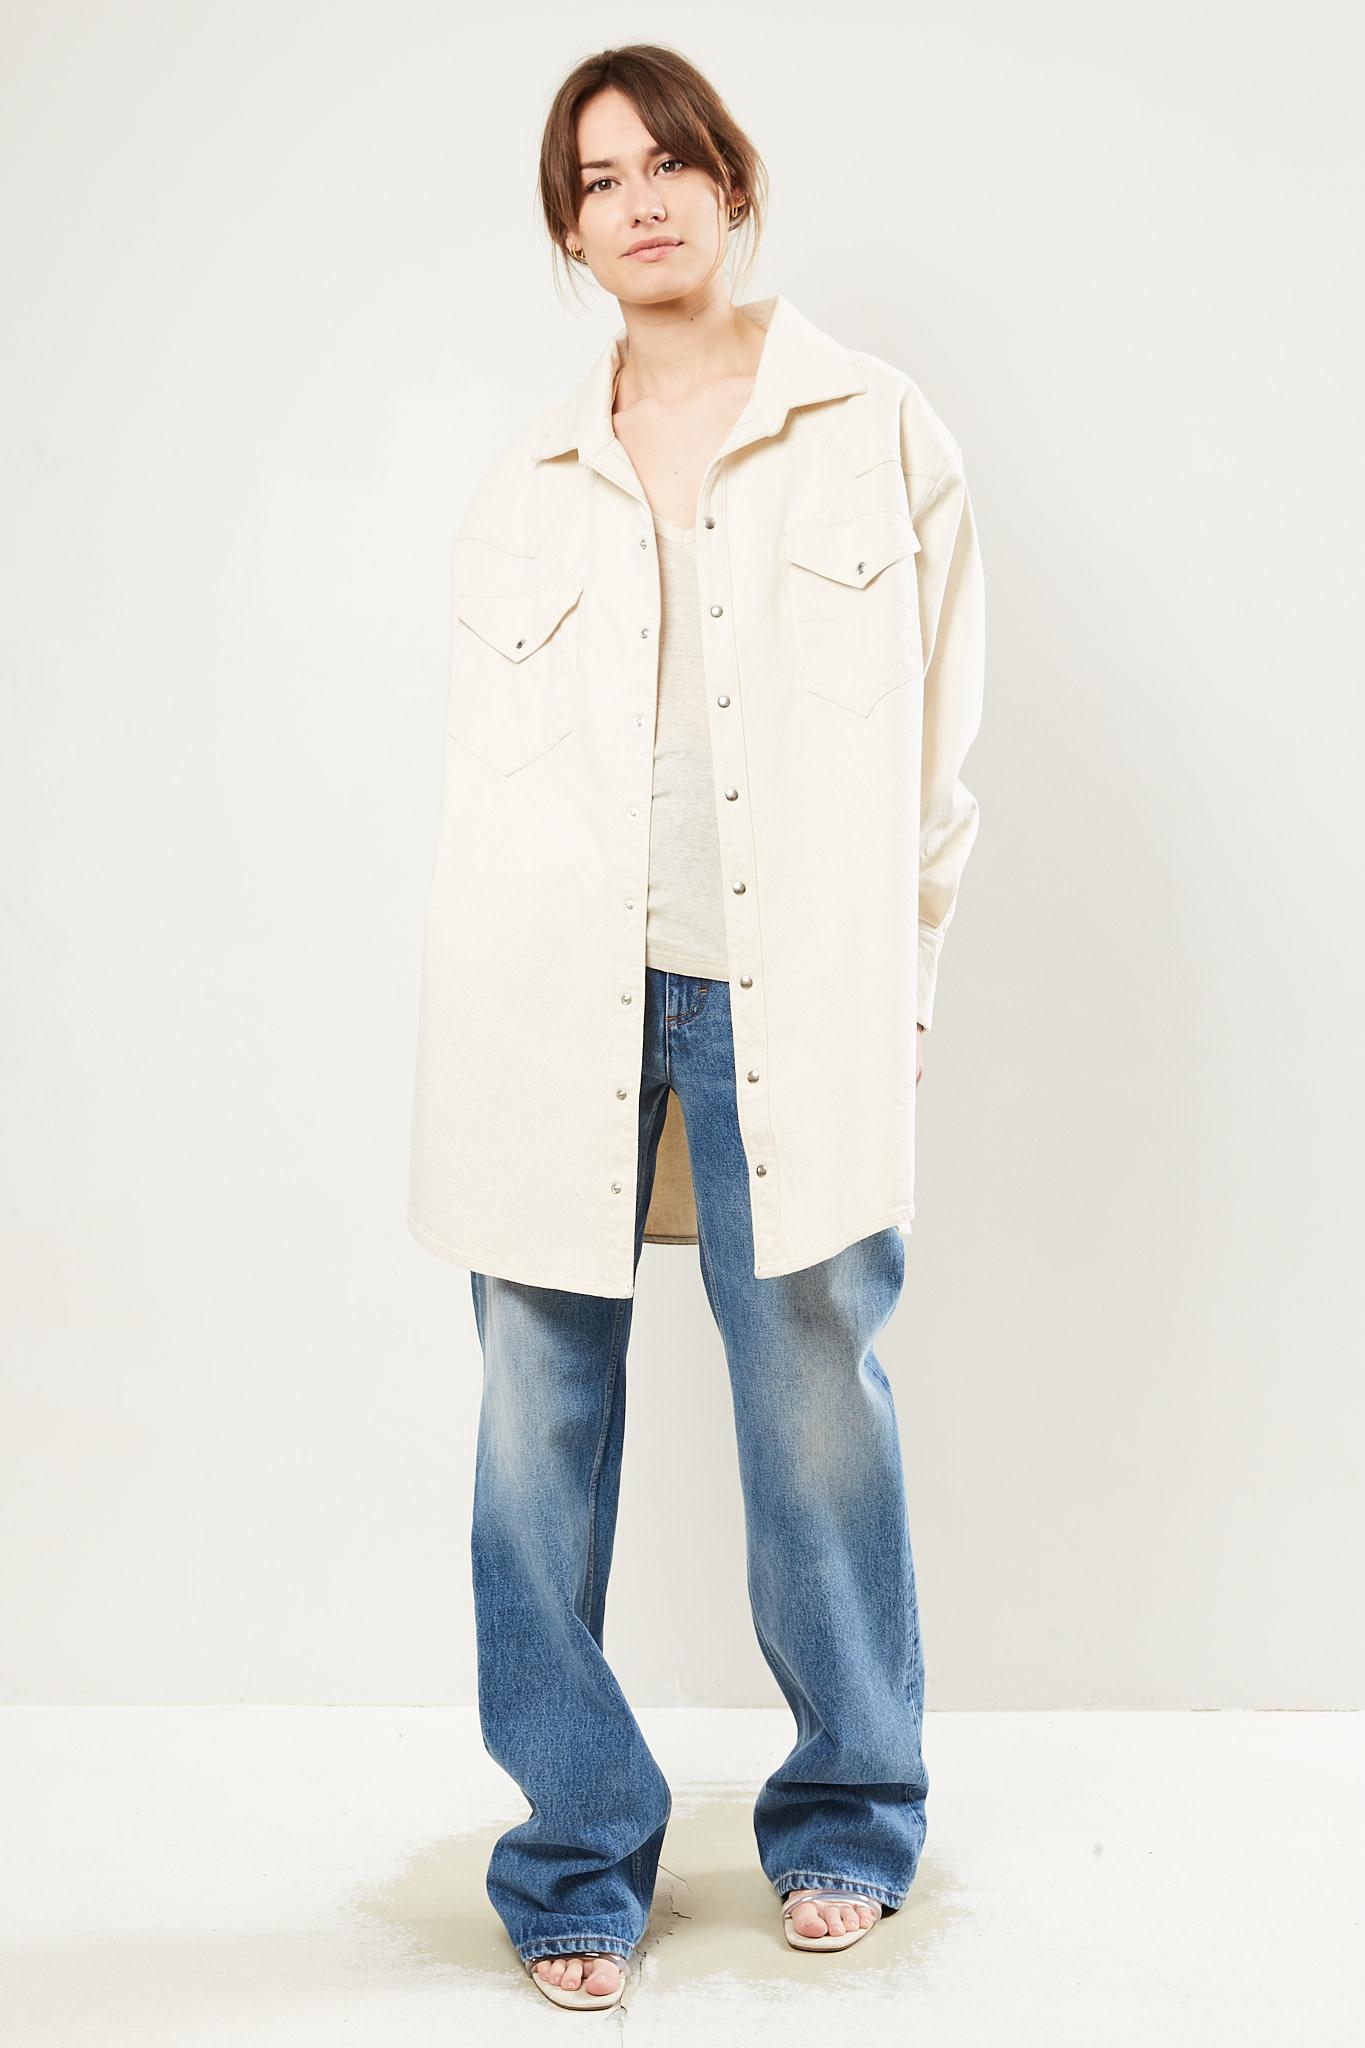 Facon Jacmīn - Gloria oversized shirt dress